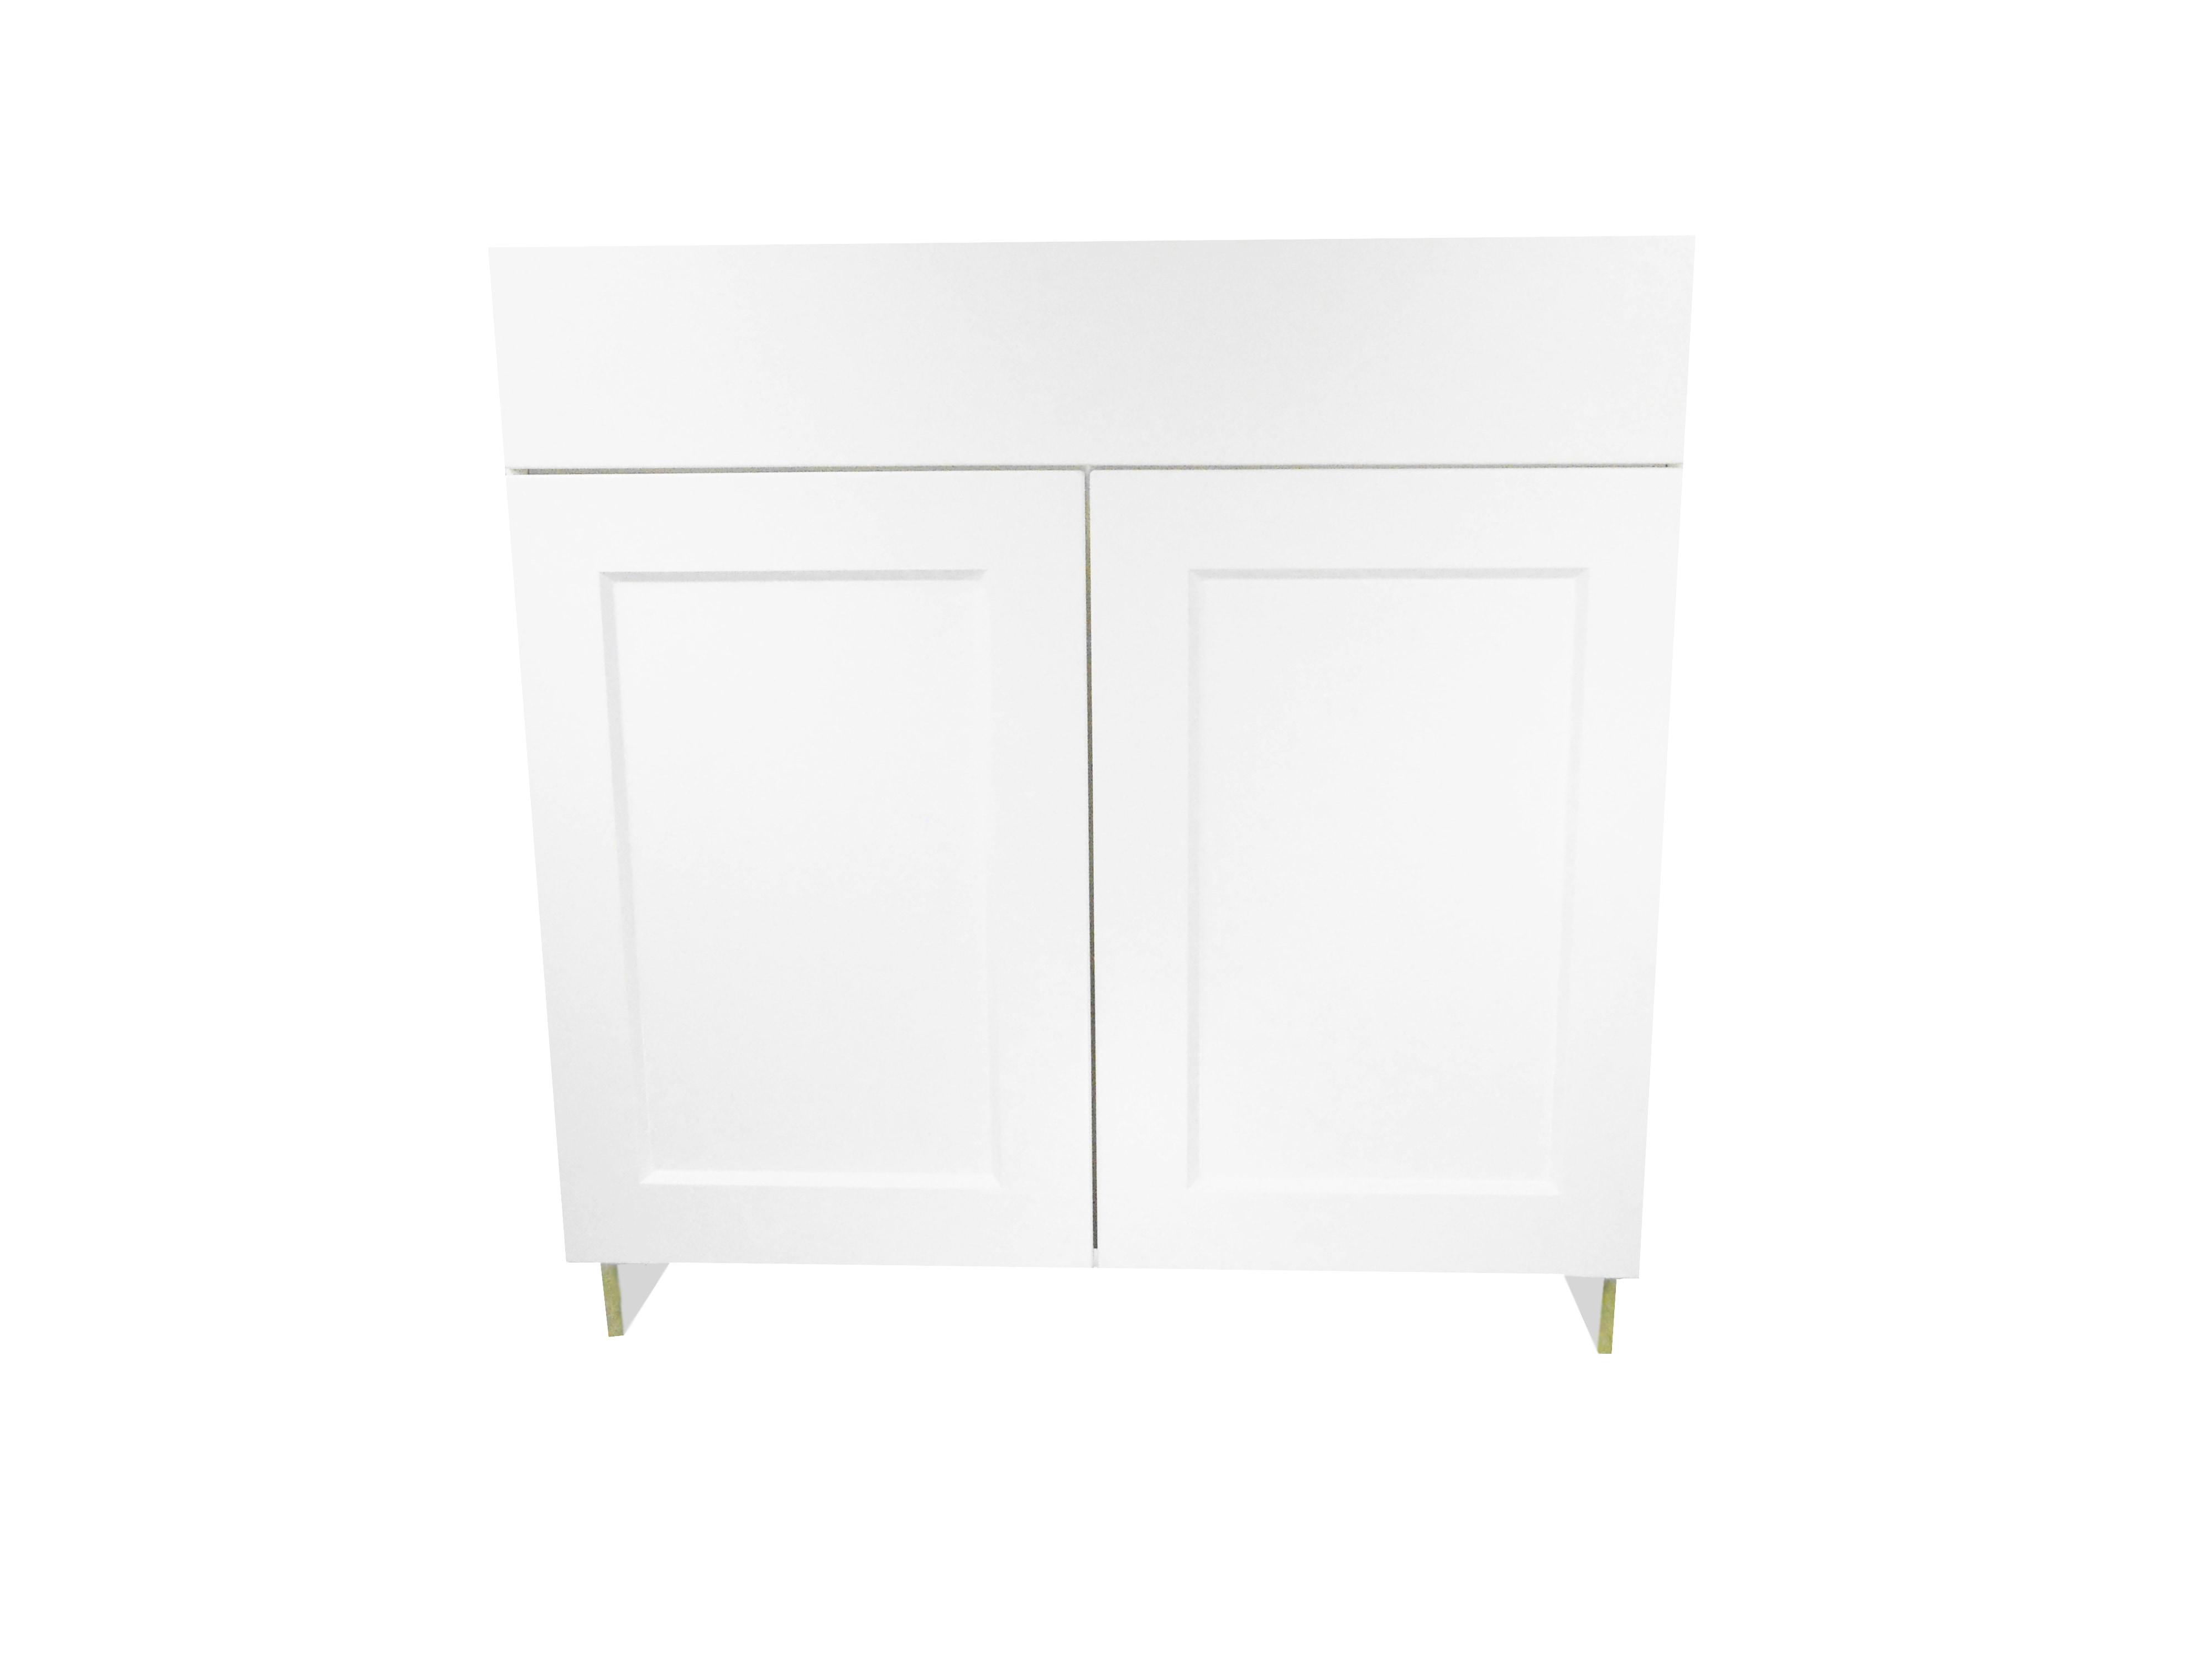 Base Cabinet with Drawer/2 Door / Wistler White / Flat Panel White / 36 Whistler White 0